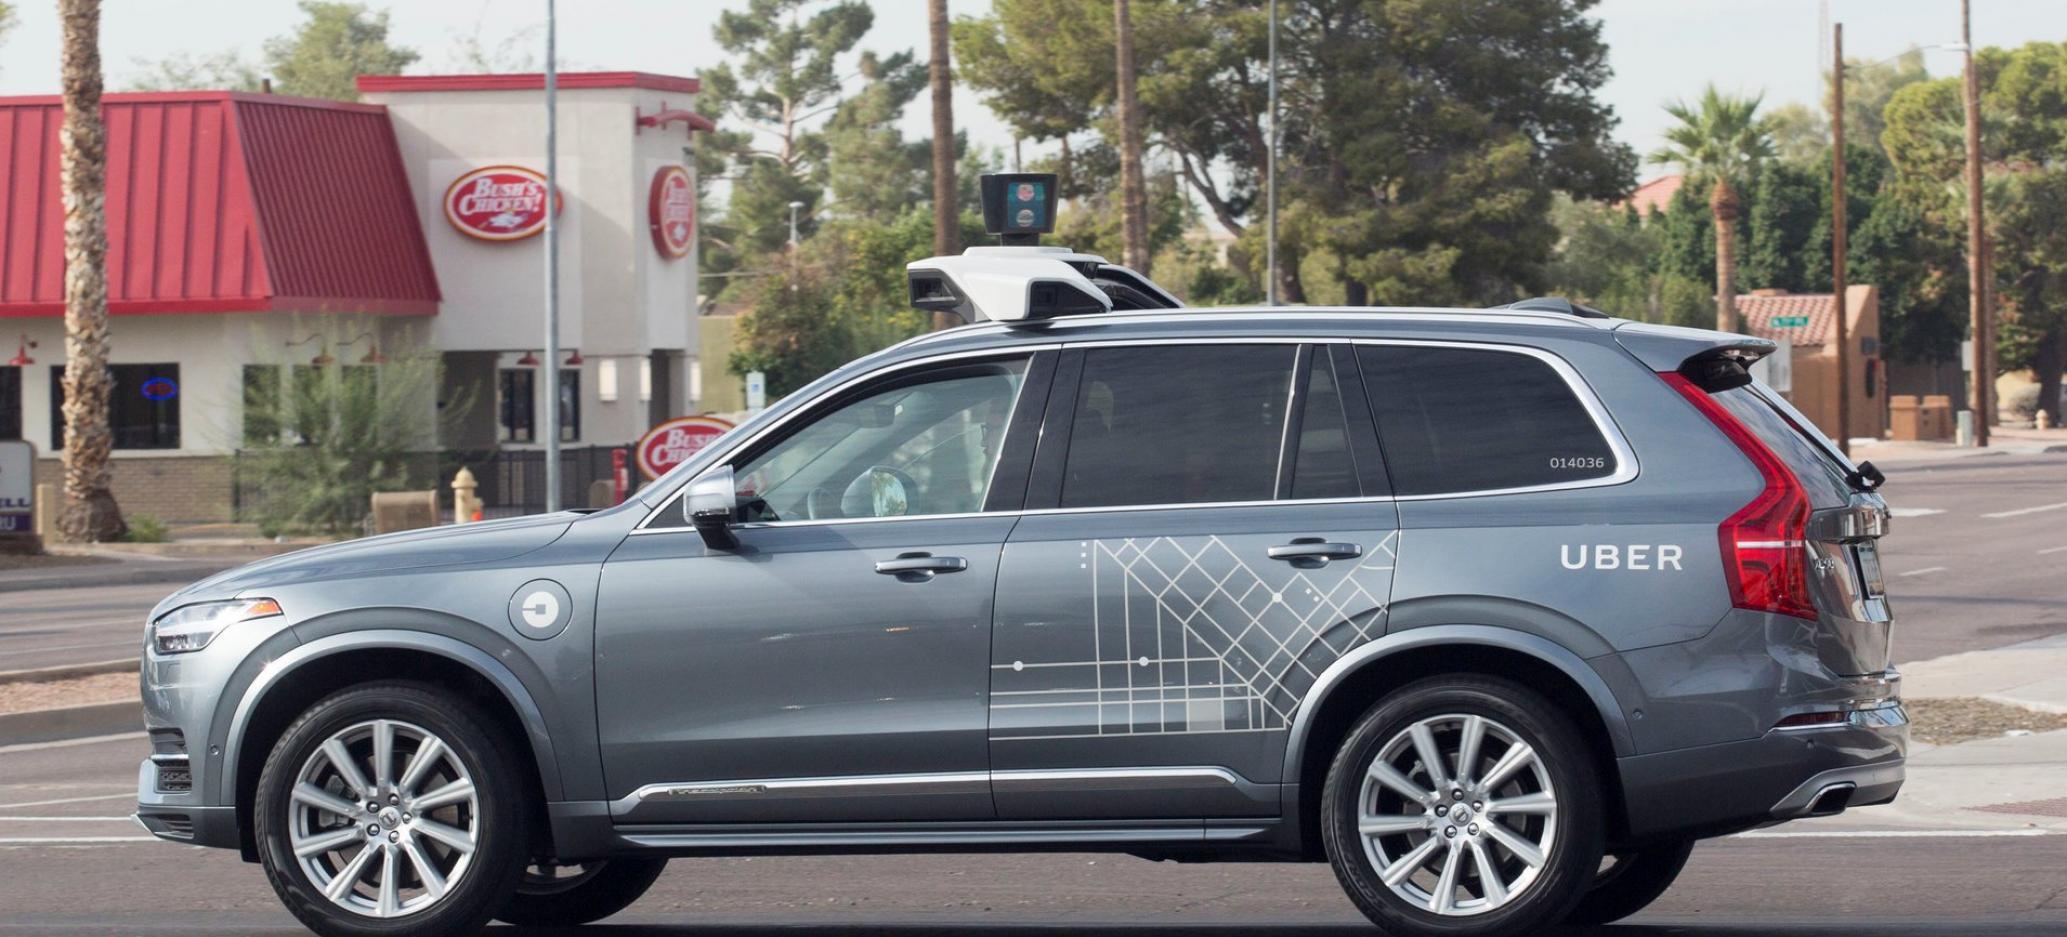 Self-Driving Uber Car Hit and Killed Arizona Woman Crossing Street